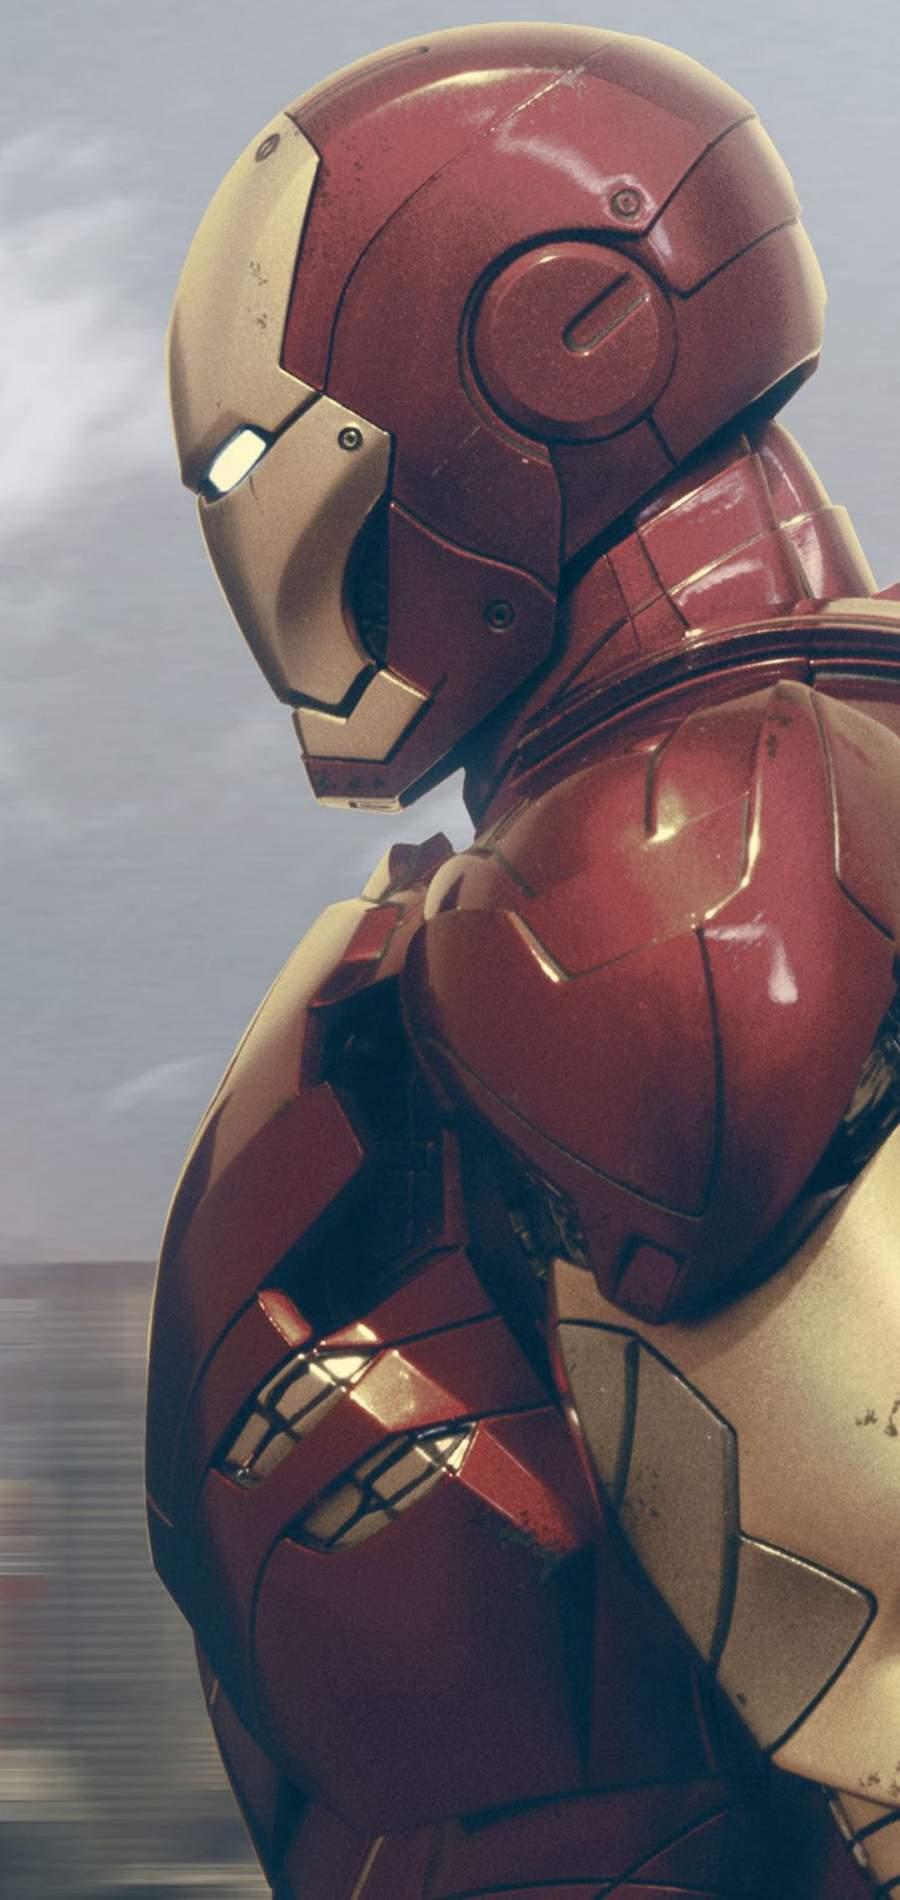 Iron Man SuperHero iPhone Wallpaper - iPhone Wallpapers